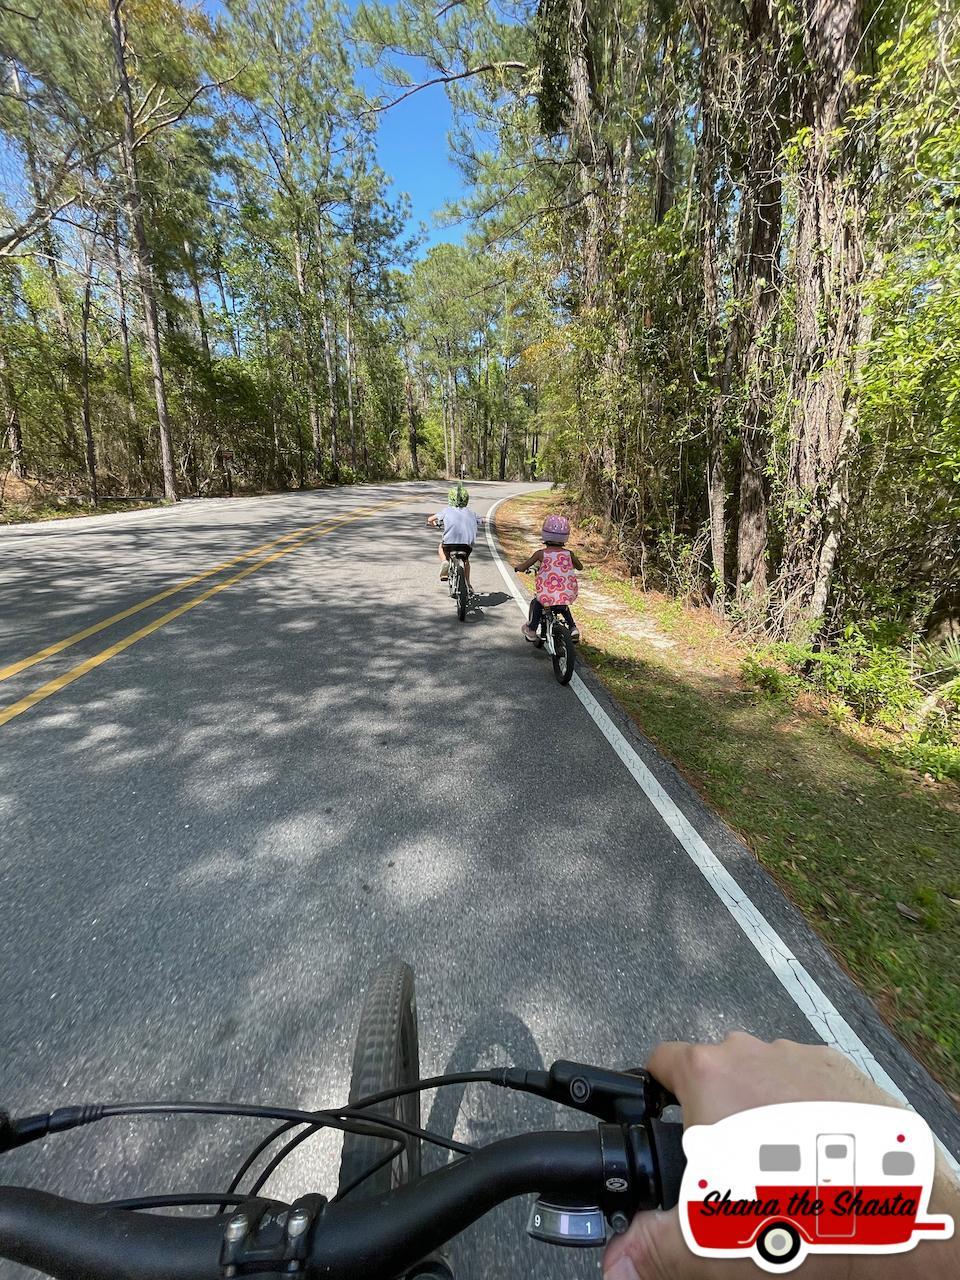 Cycling-around-Gulf-Islands-National-Seashore